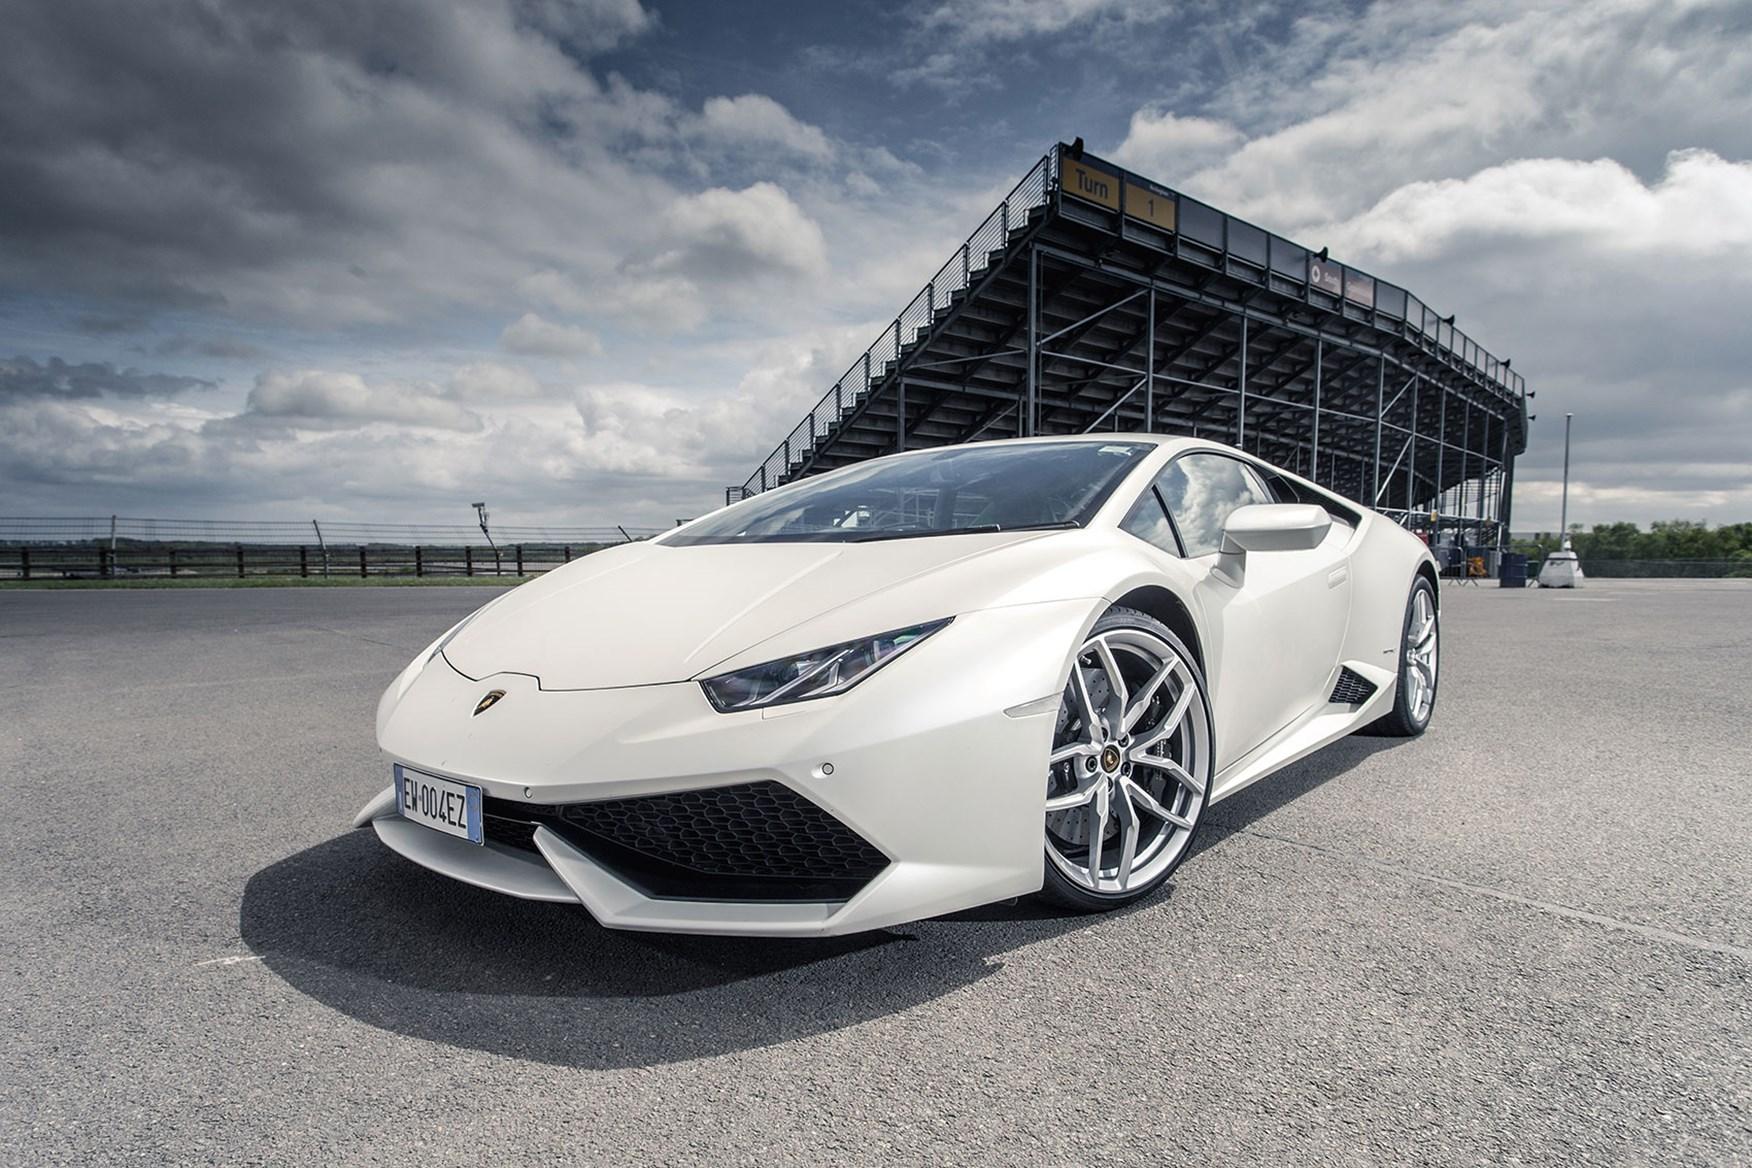 99_lamborghinihuracan Amazing 2015 Lamborghini Huracan Price Per Month Cars Trend